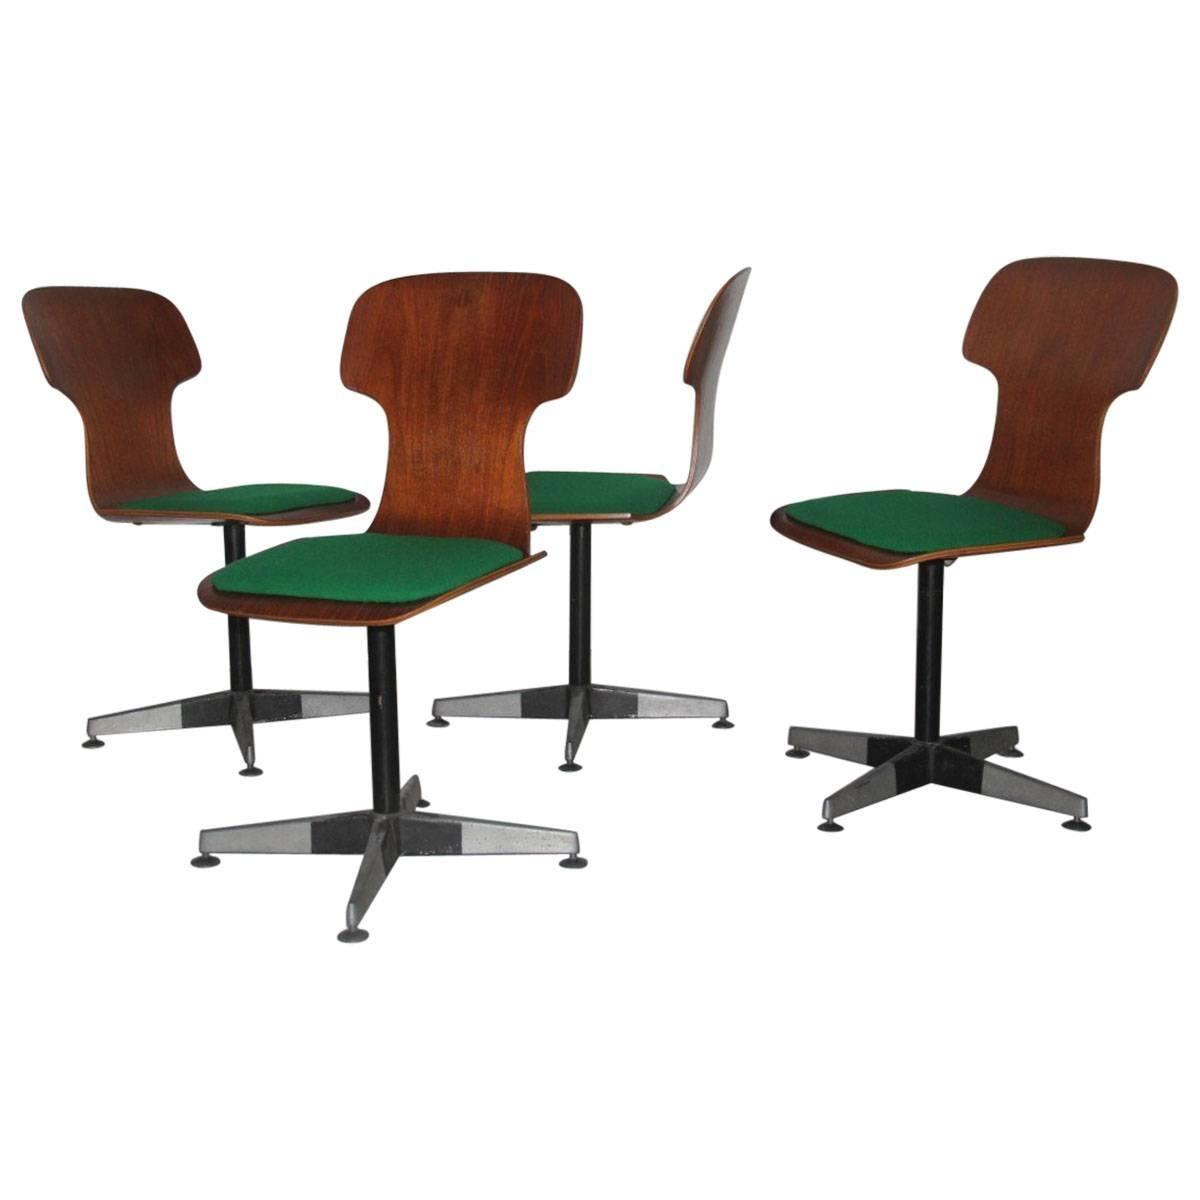 Carlo Ratti Original Chairs Mid-Century Bentwood Italian Design